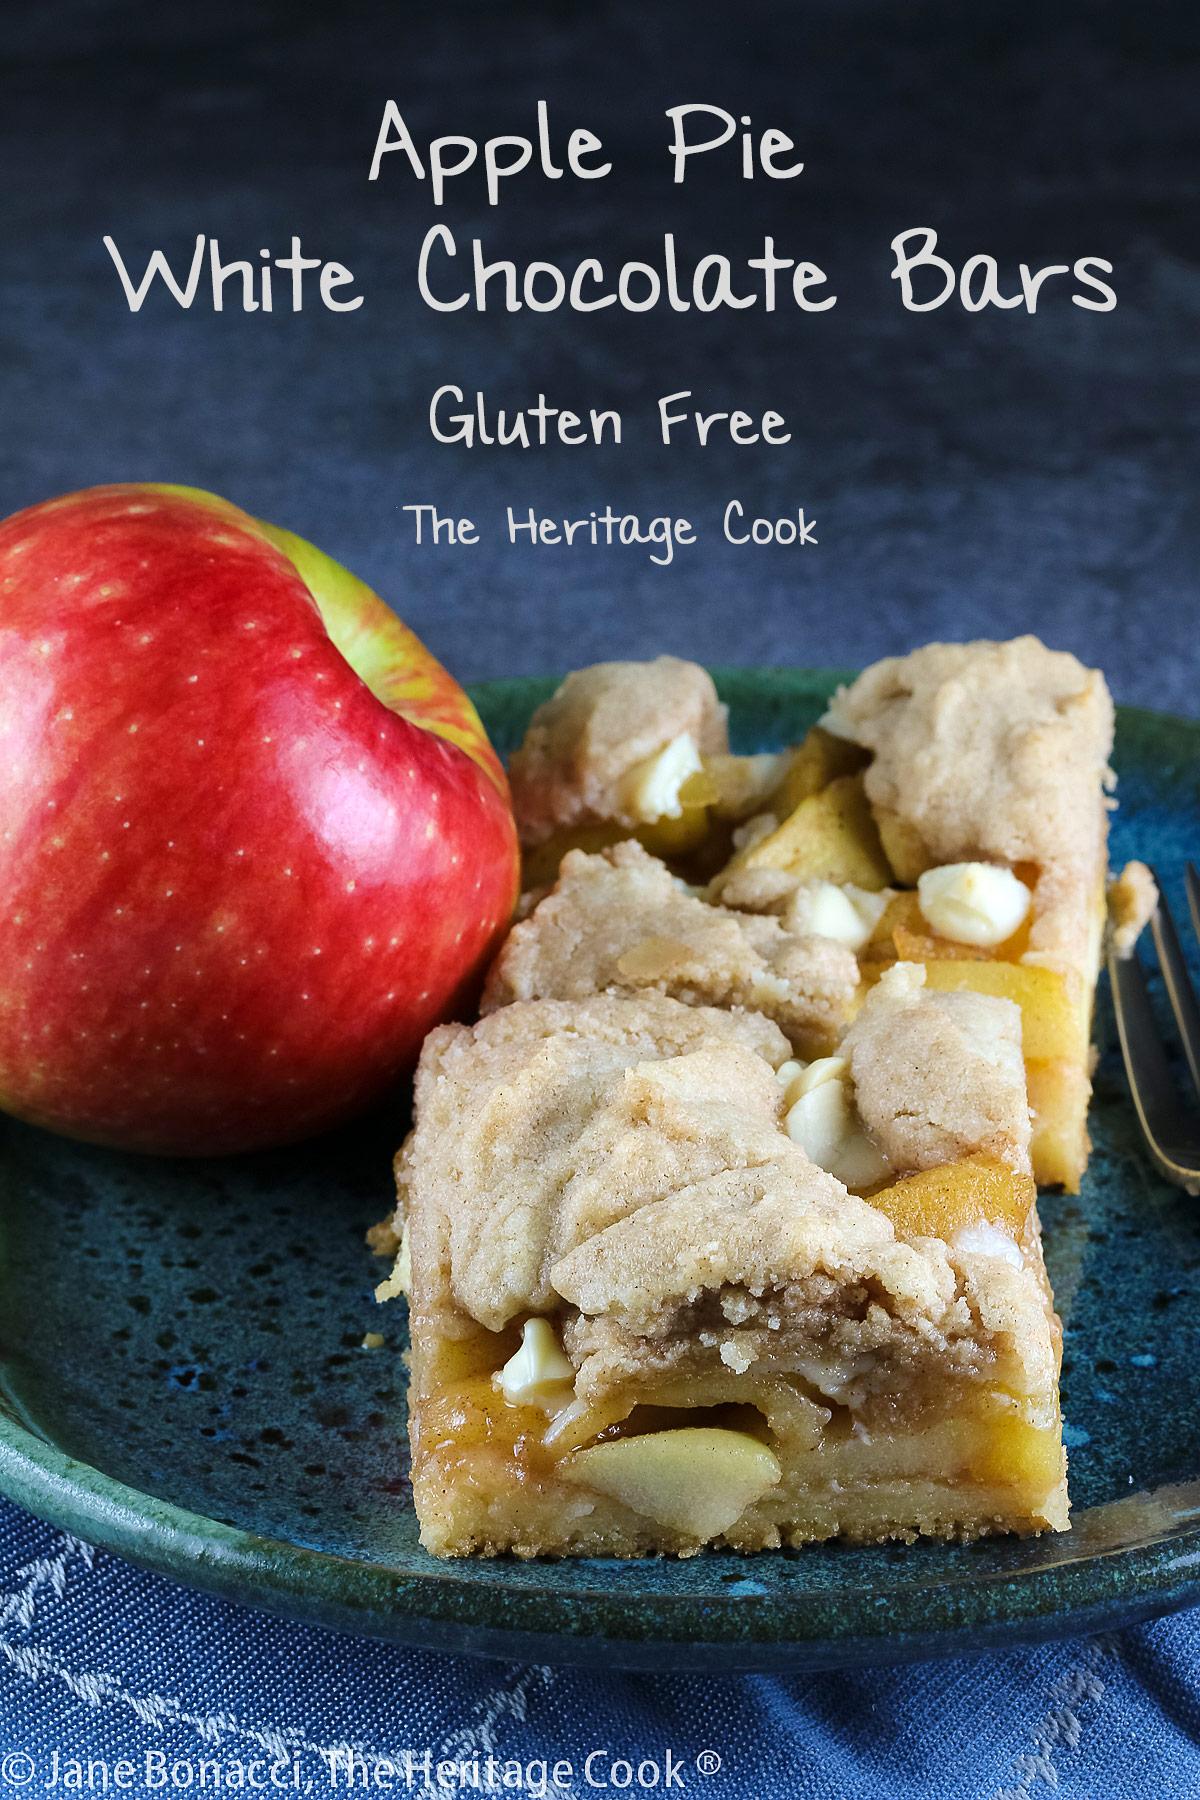 Apple Pie White Chocolate Bars © 2021 Jane Bonacci, The Heritage Cook